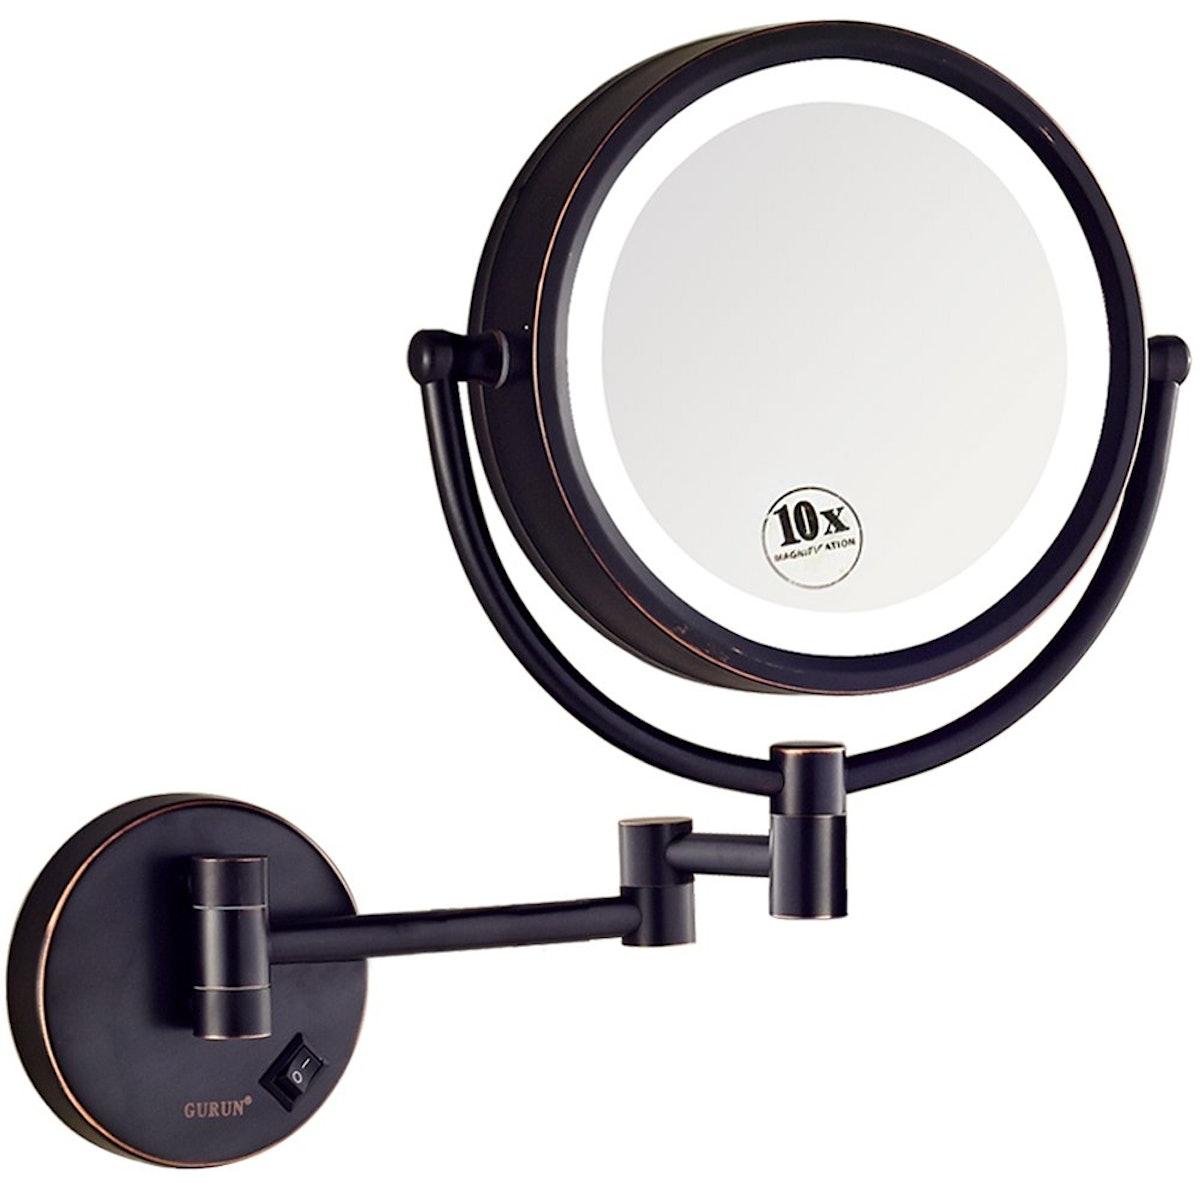 GURUN LED Lighted Wall Mount Makeup Mirror